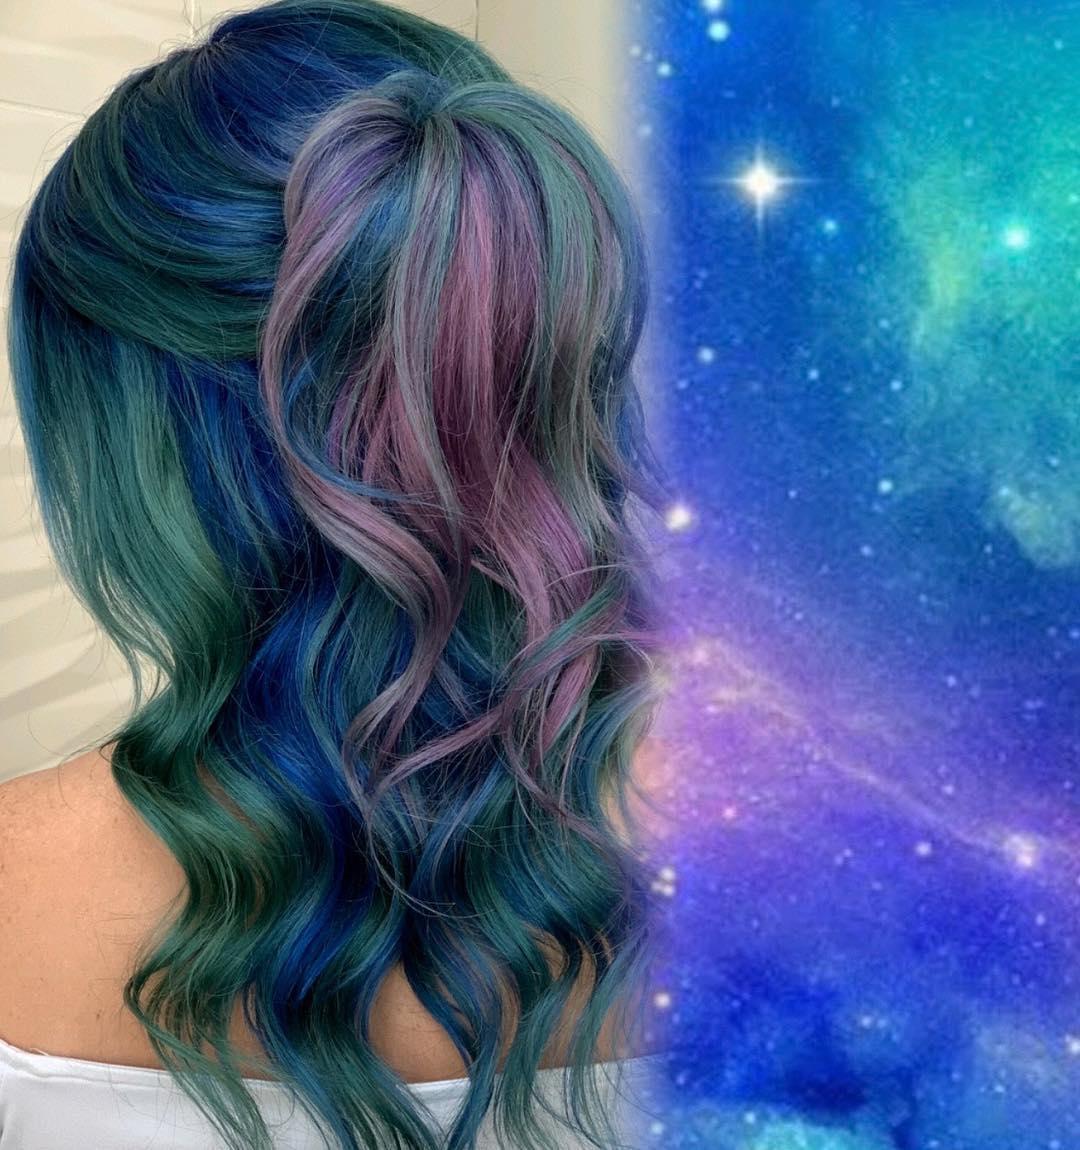 Cabelo-galaxia-Tendências-atuais-de-cor-de-cabelo-para-mulheres